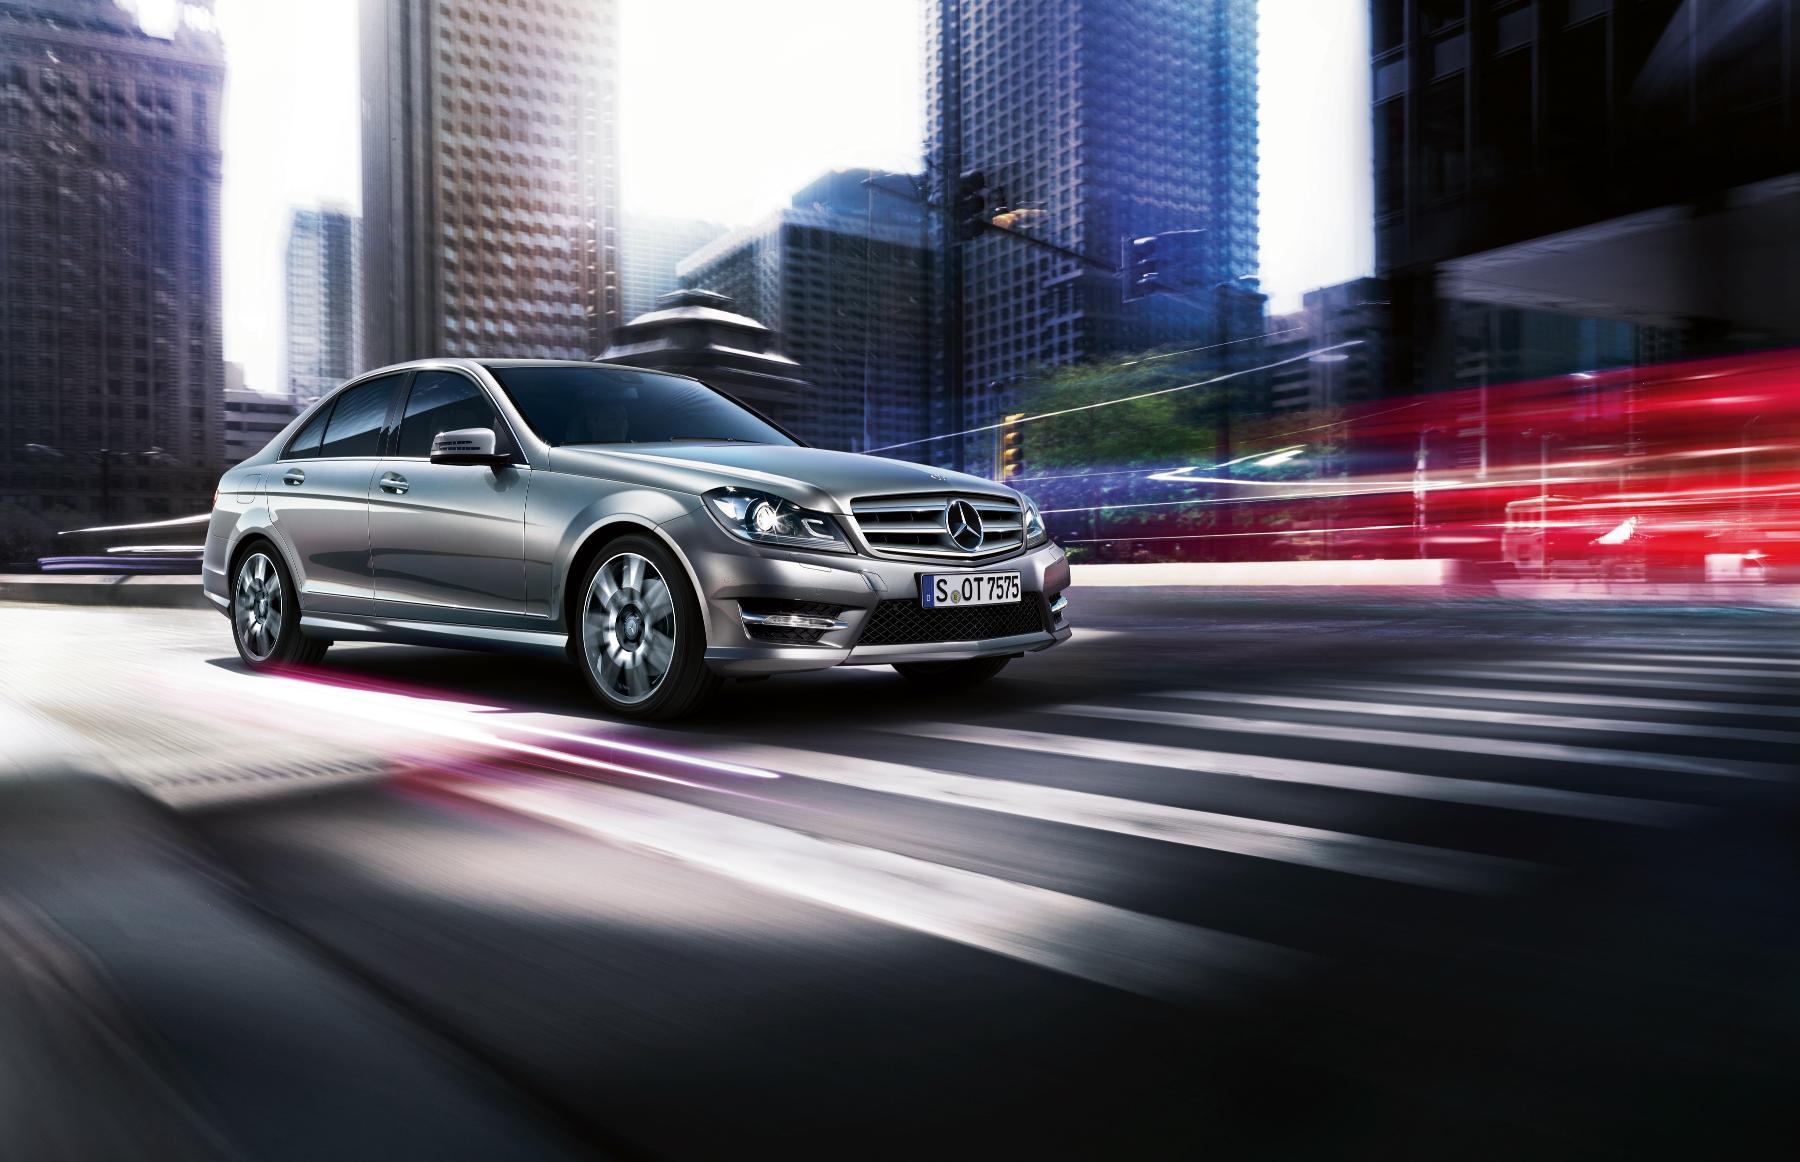 ������� ������ ���� ������ ���� 2013-Mercedes-C-Class-Saloon.jpg